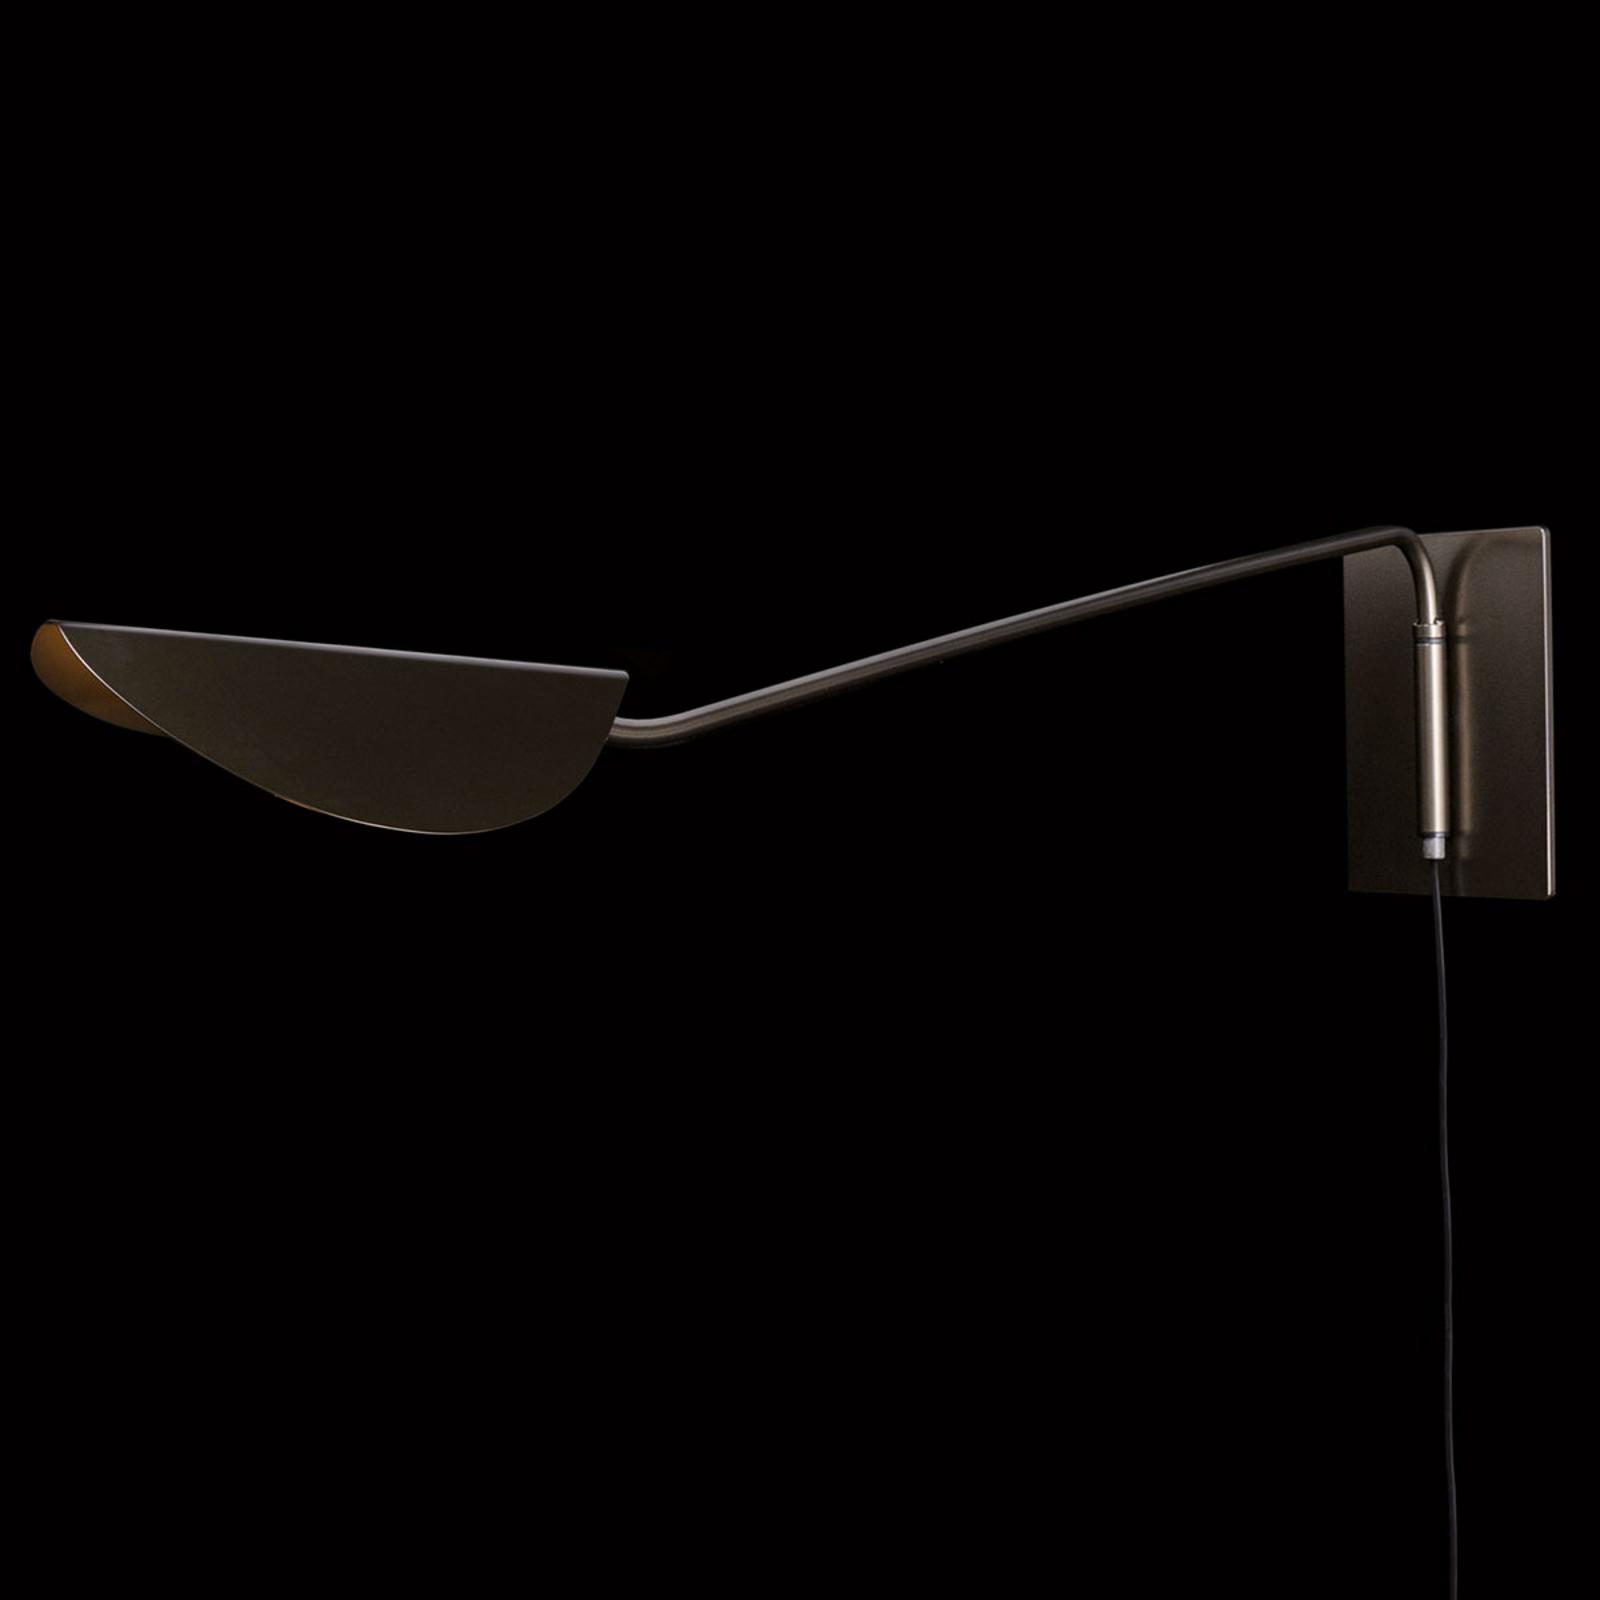 Oluce Plume lampa ścienna - rozpiętość 80 cm